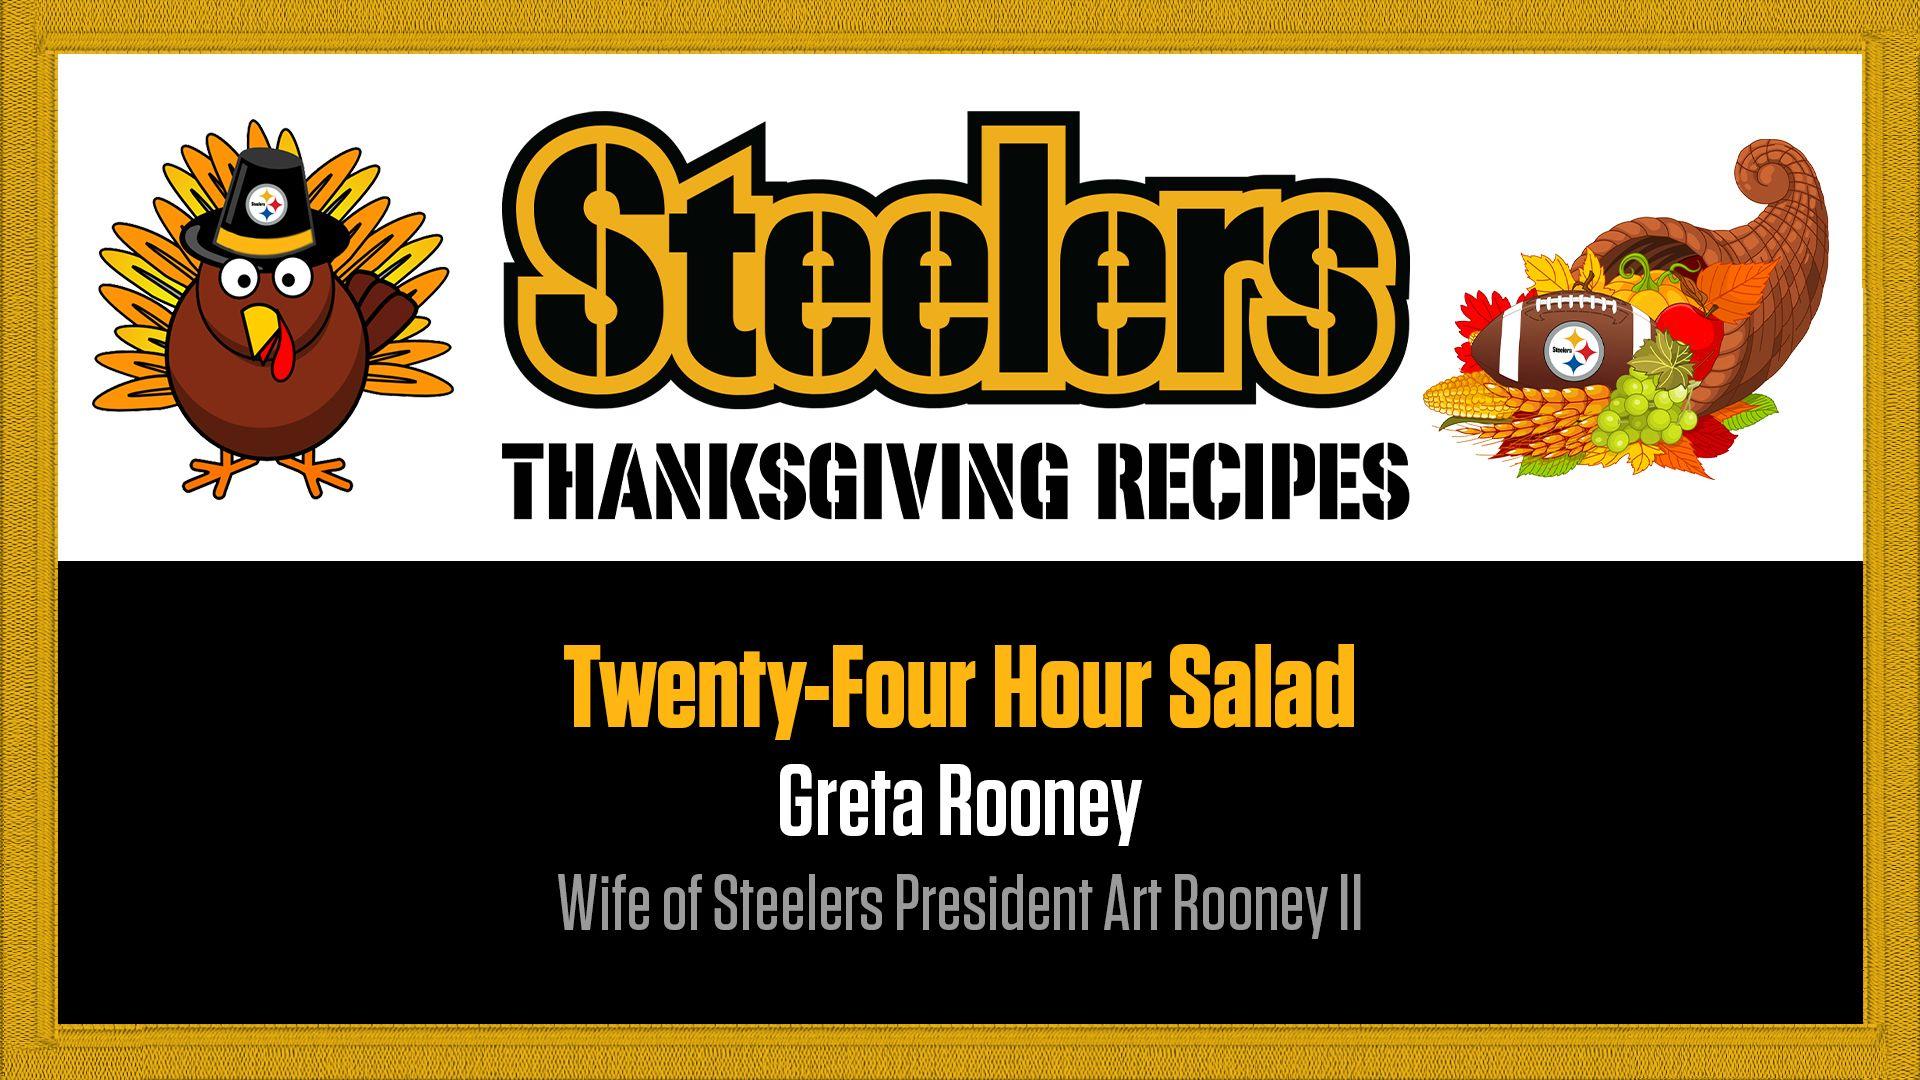 24 hour salad_greta rooney